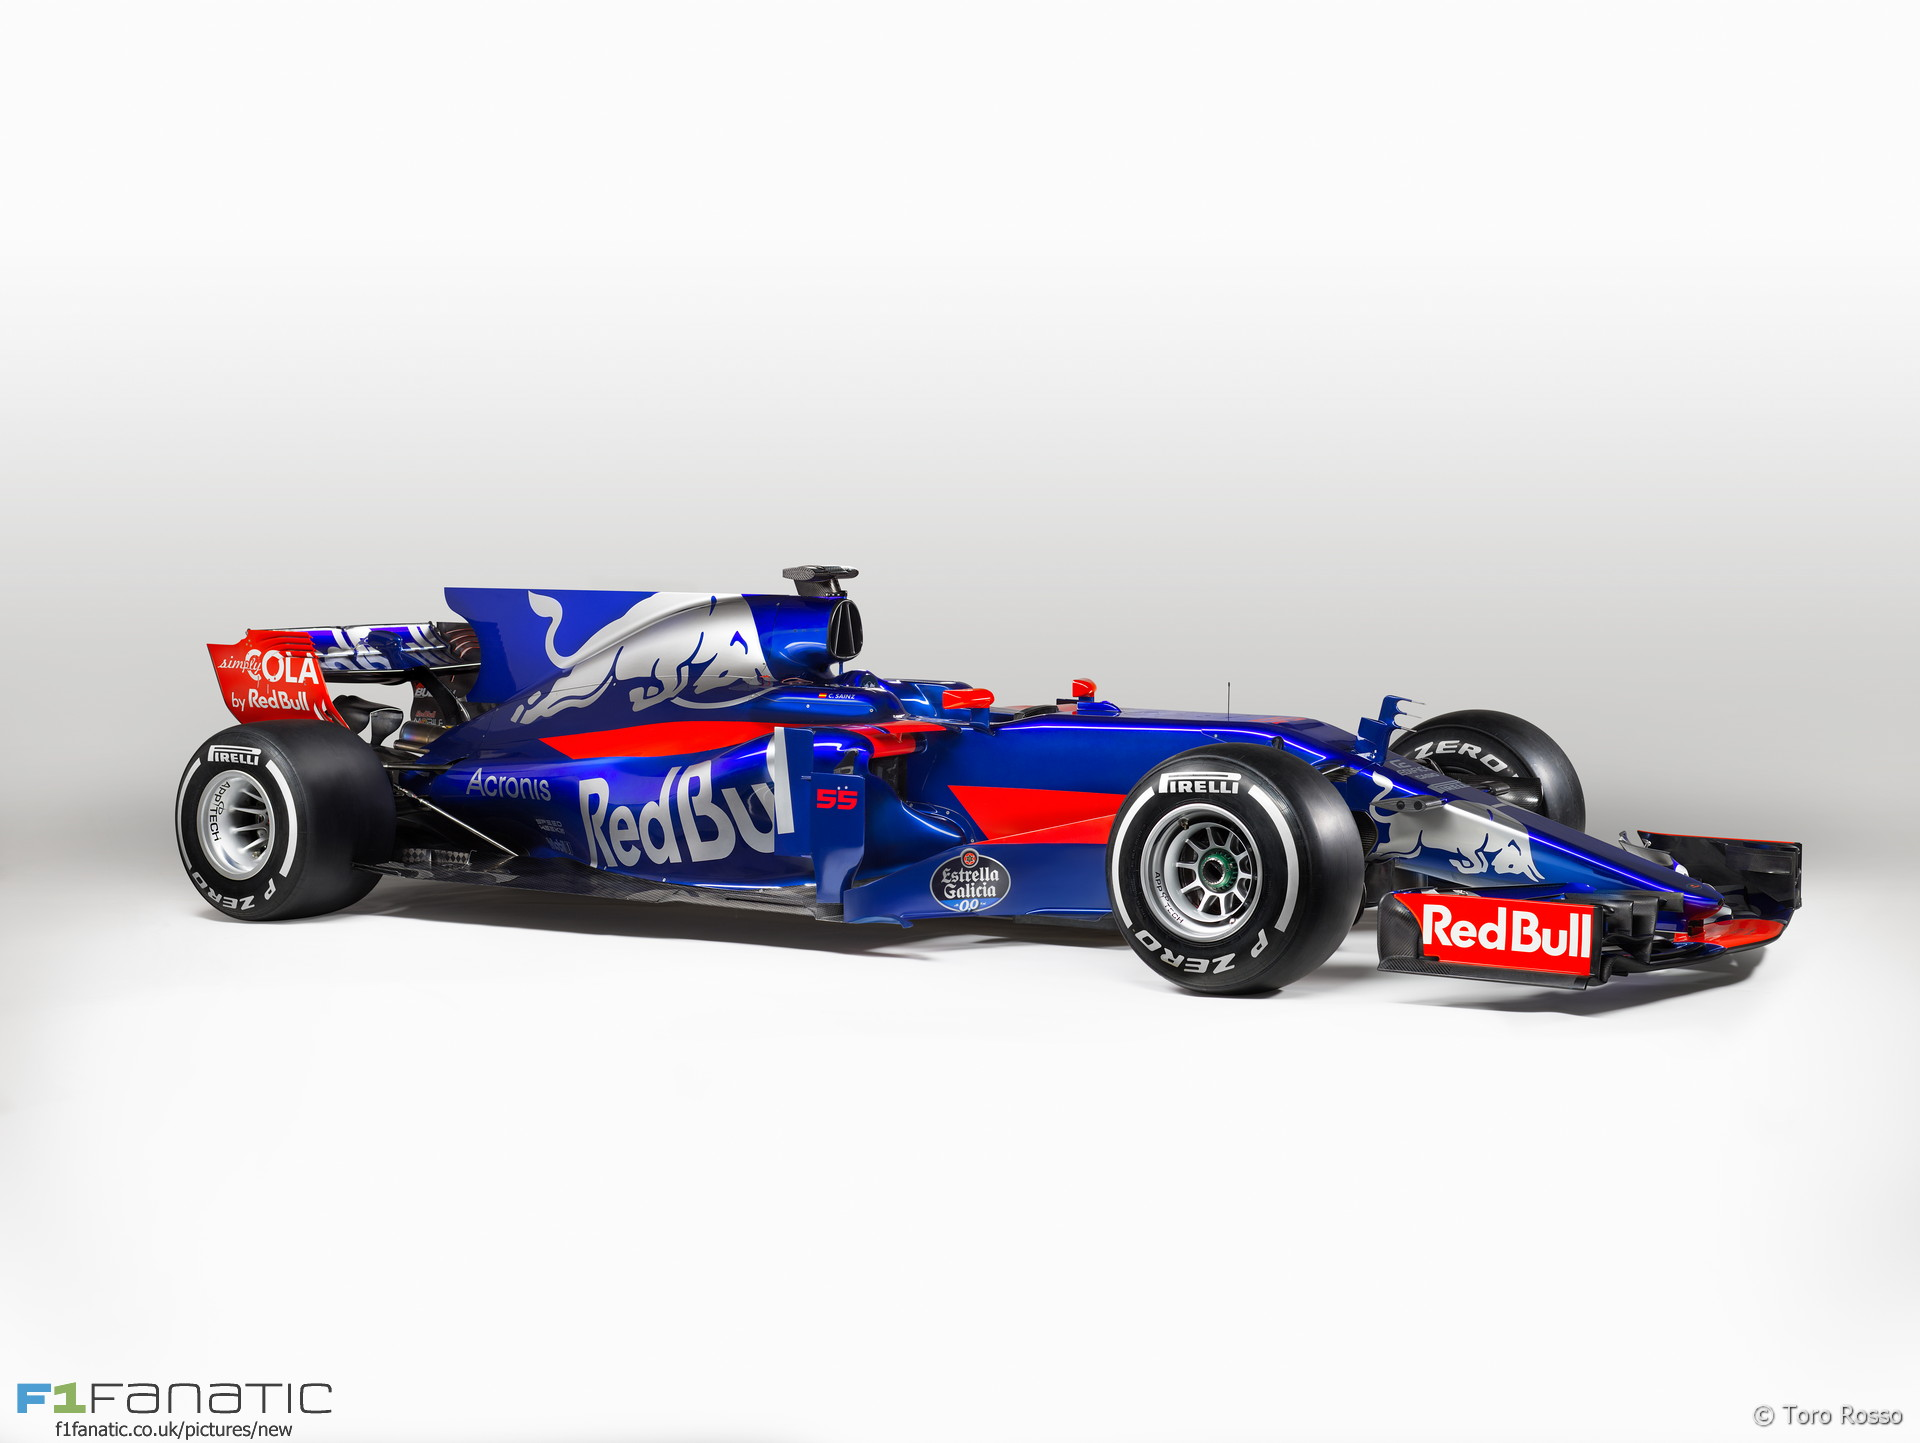 Toro Rosso Str12 2017 Formula One Car Pictures F1 Fanatic